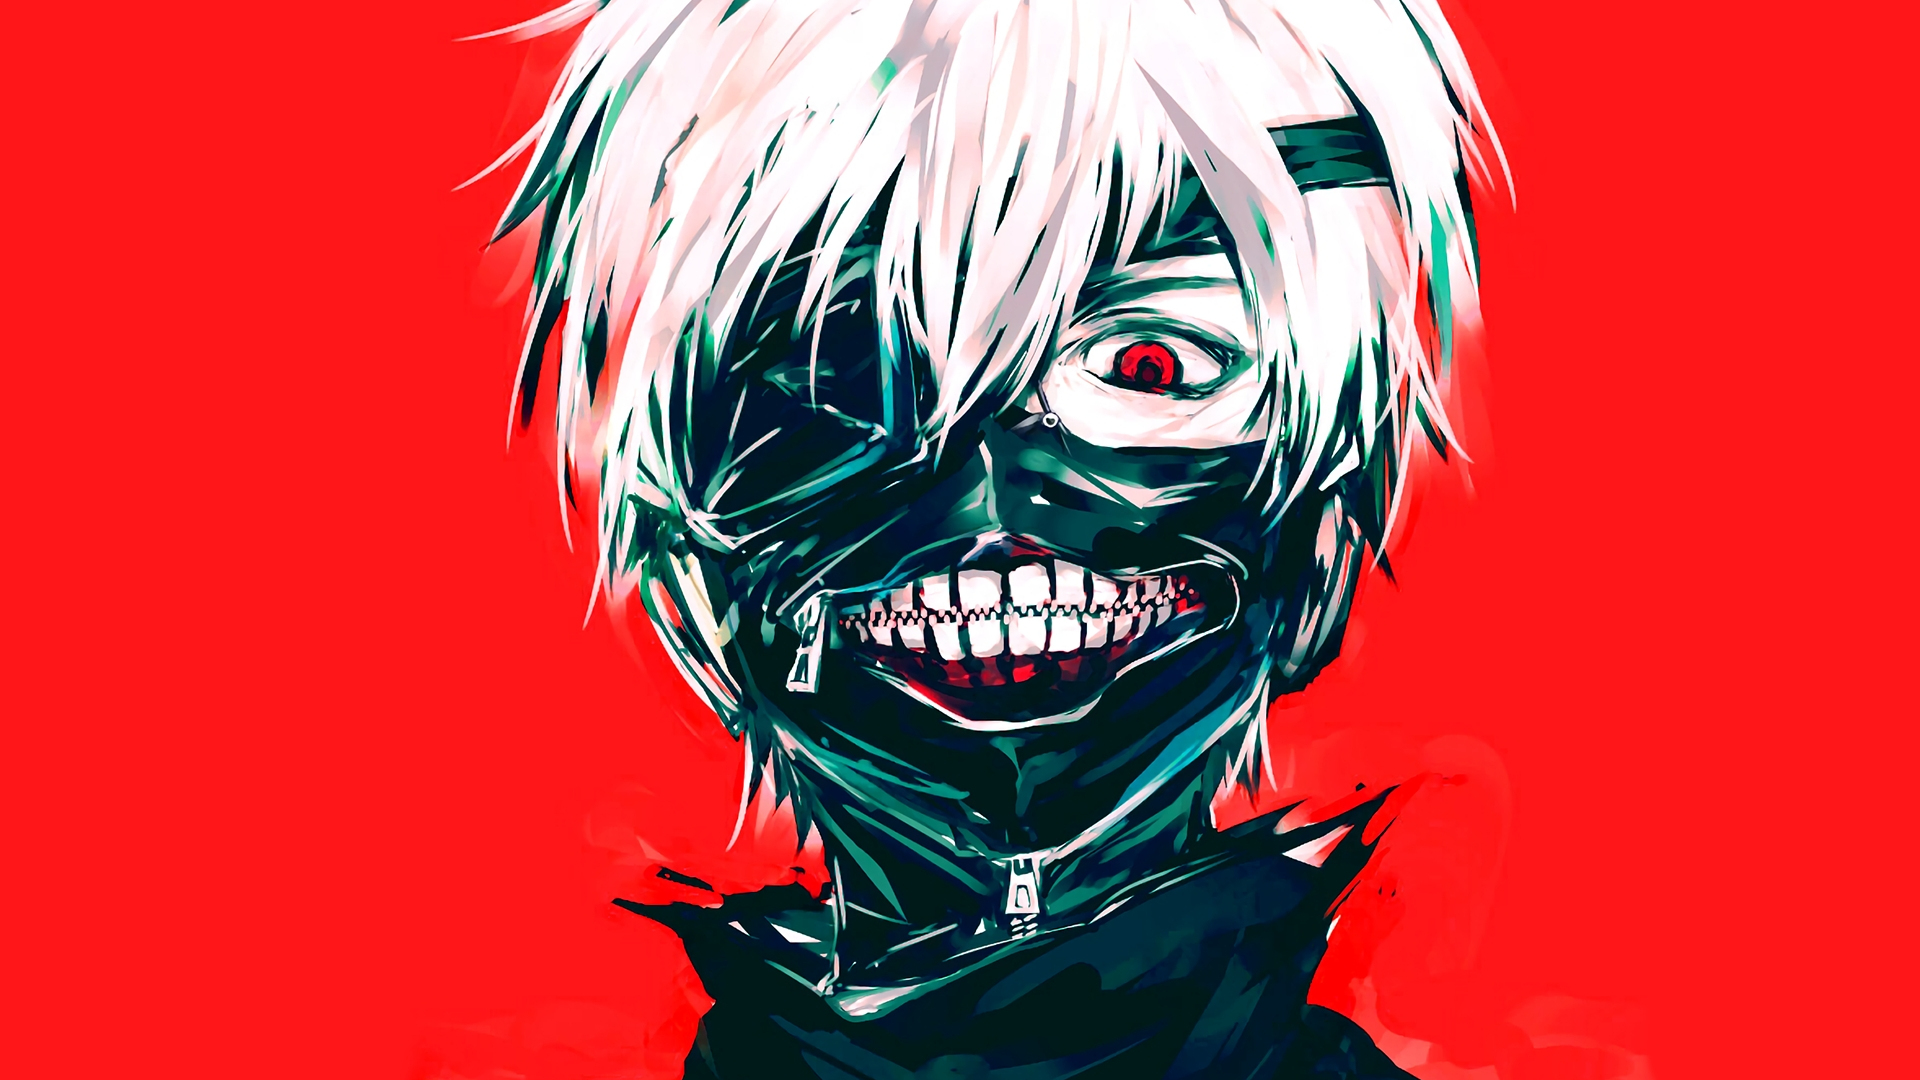 Download 1920x1080 Wallpaper Ken Kaneki Anime Boy Anime Full Hd